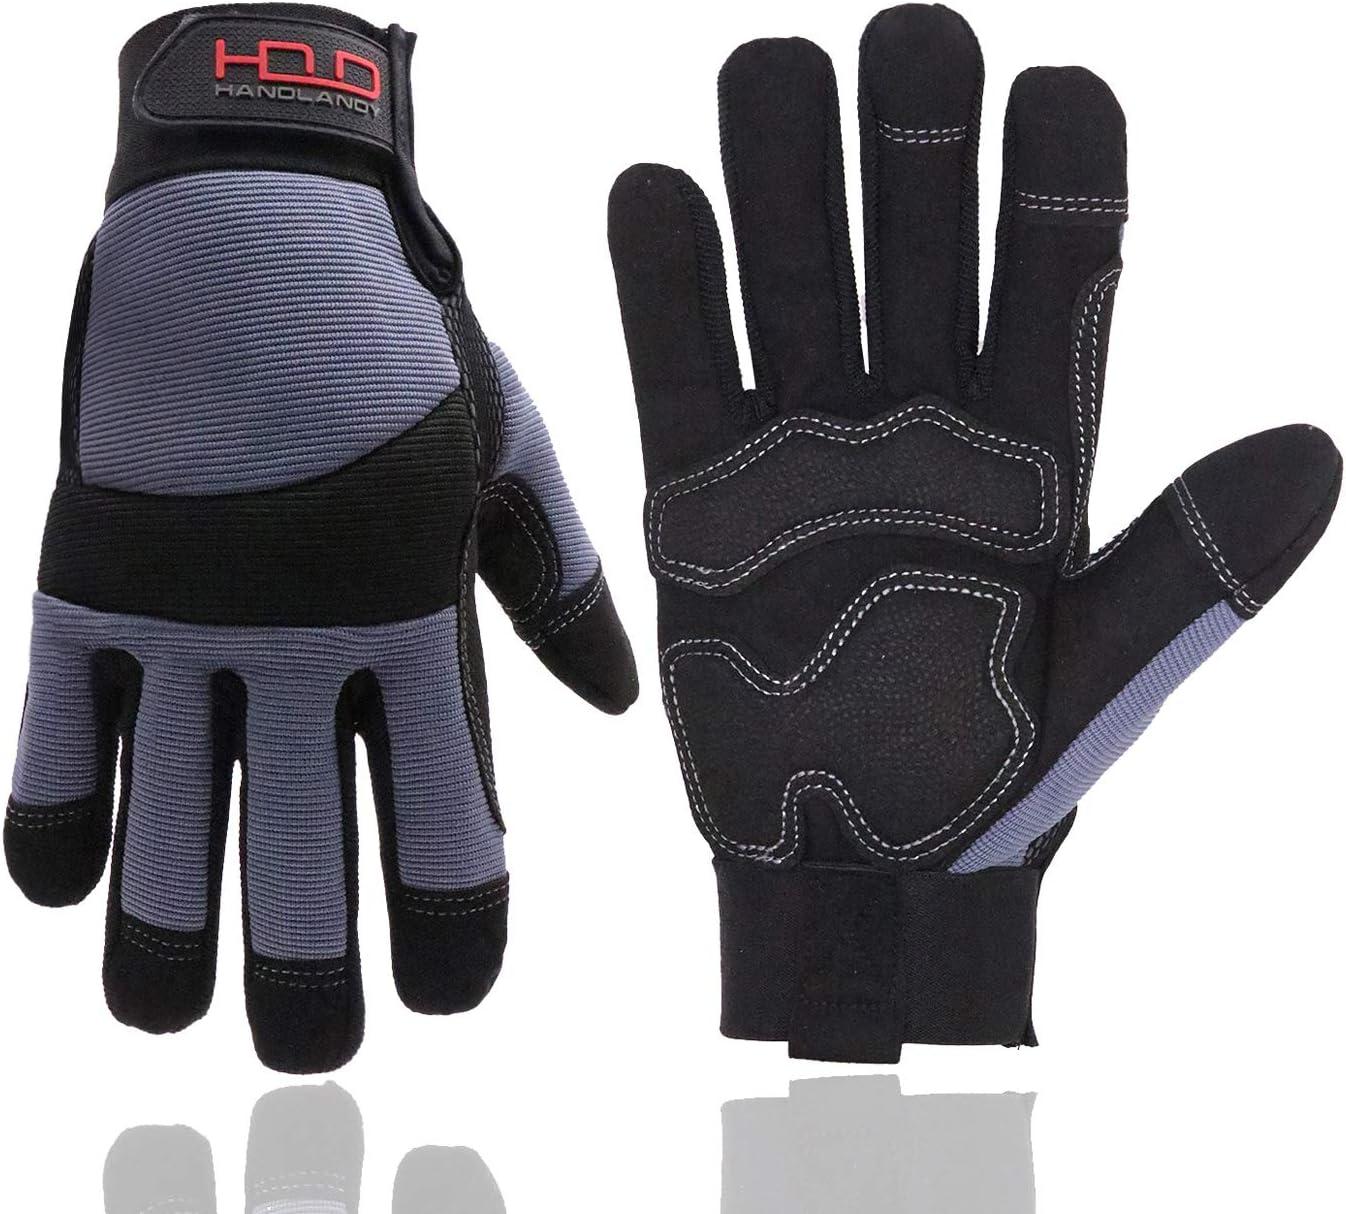 HANDLANDY Anti Vibration Safety Work Men Super Special SALE held for Breat Ranking TOP1 Gloves Women